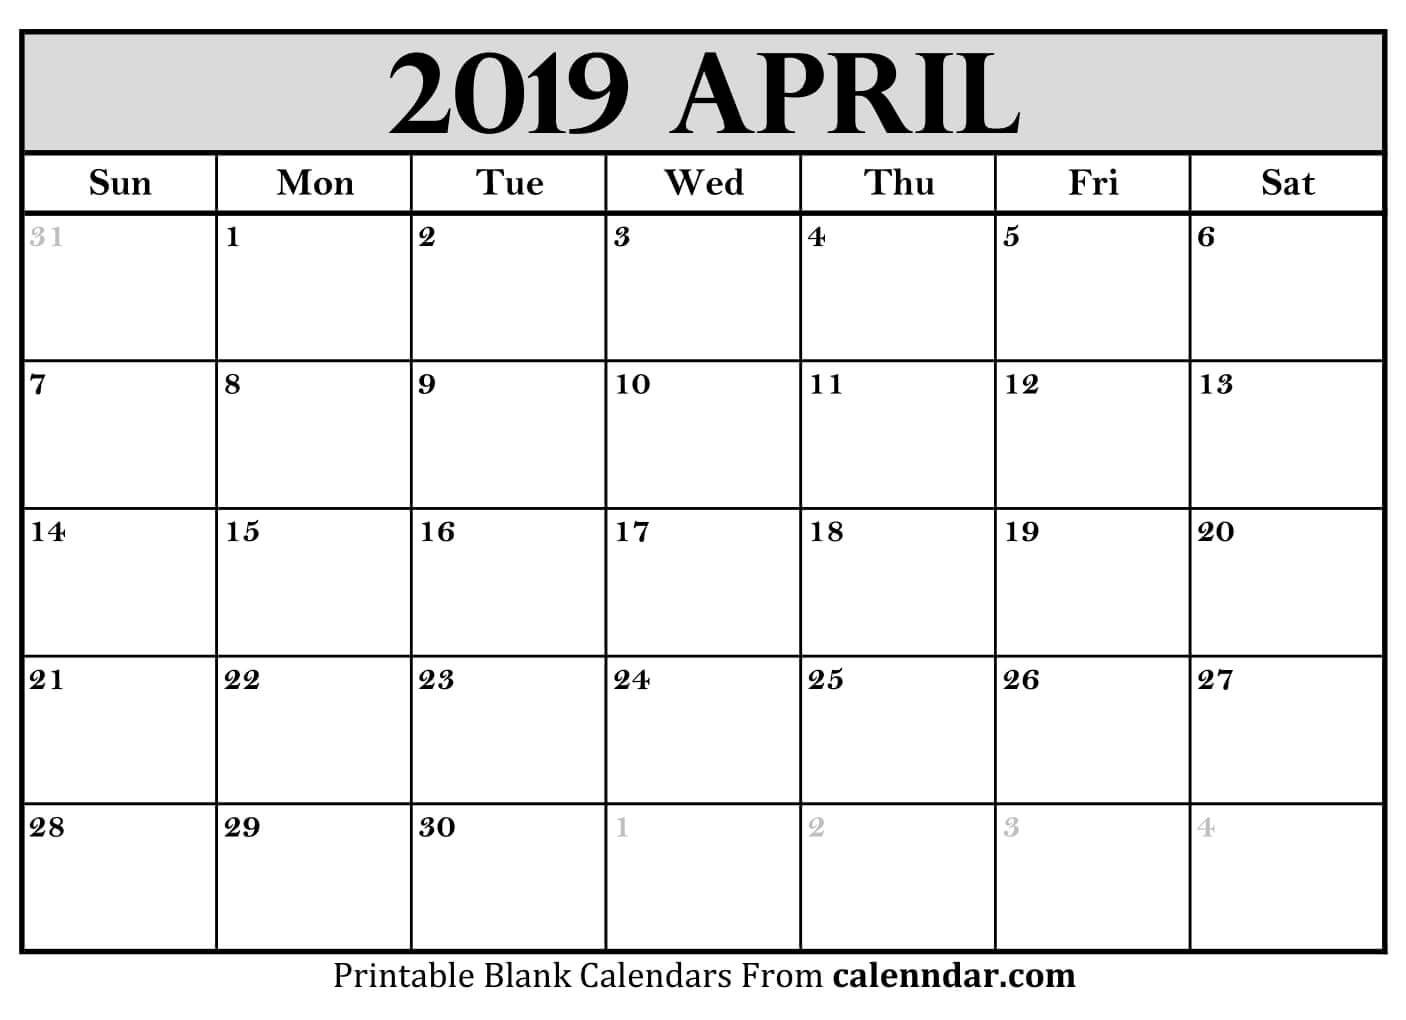 Blank April 2019 Calendar Templates – Calenndar April 3 2019 Calendar